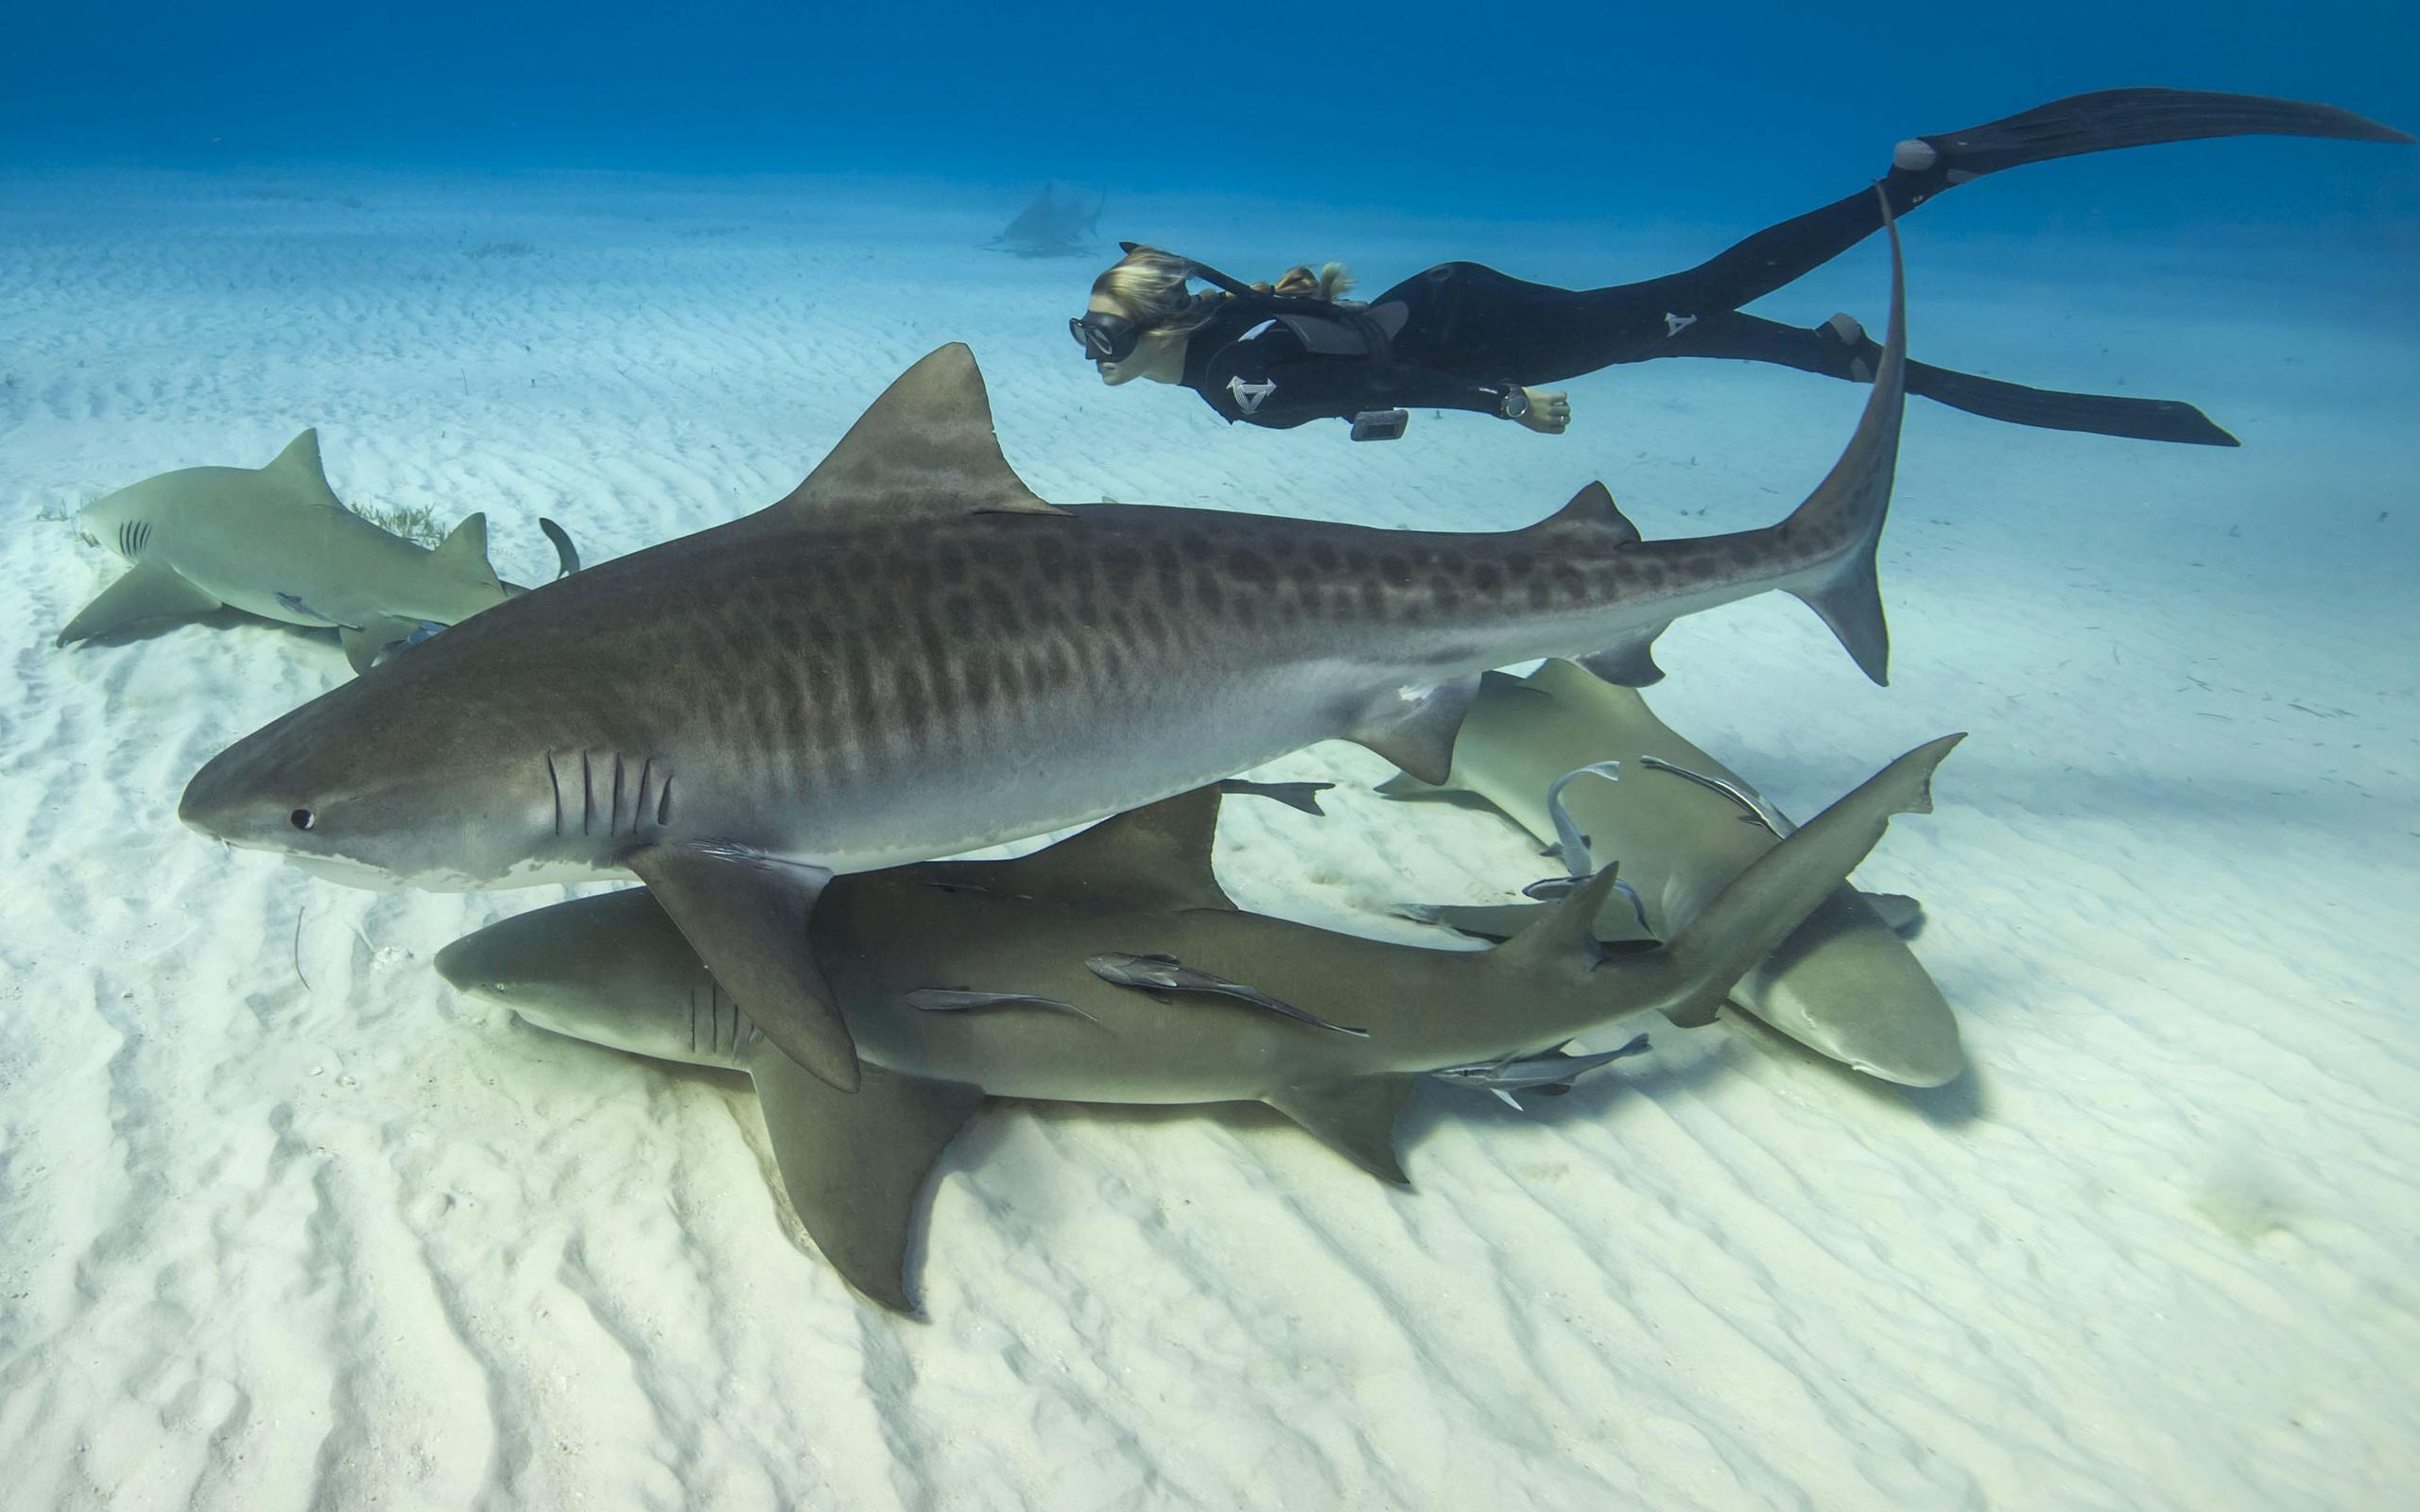 фото, под водой, акулы, девушка, акула, хищница, дайвинг, красава